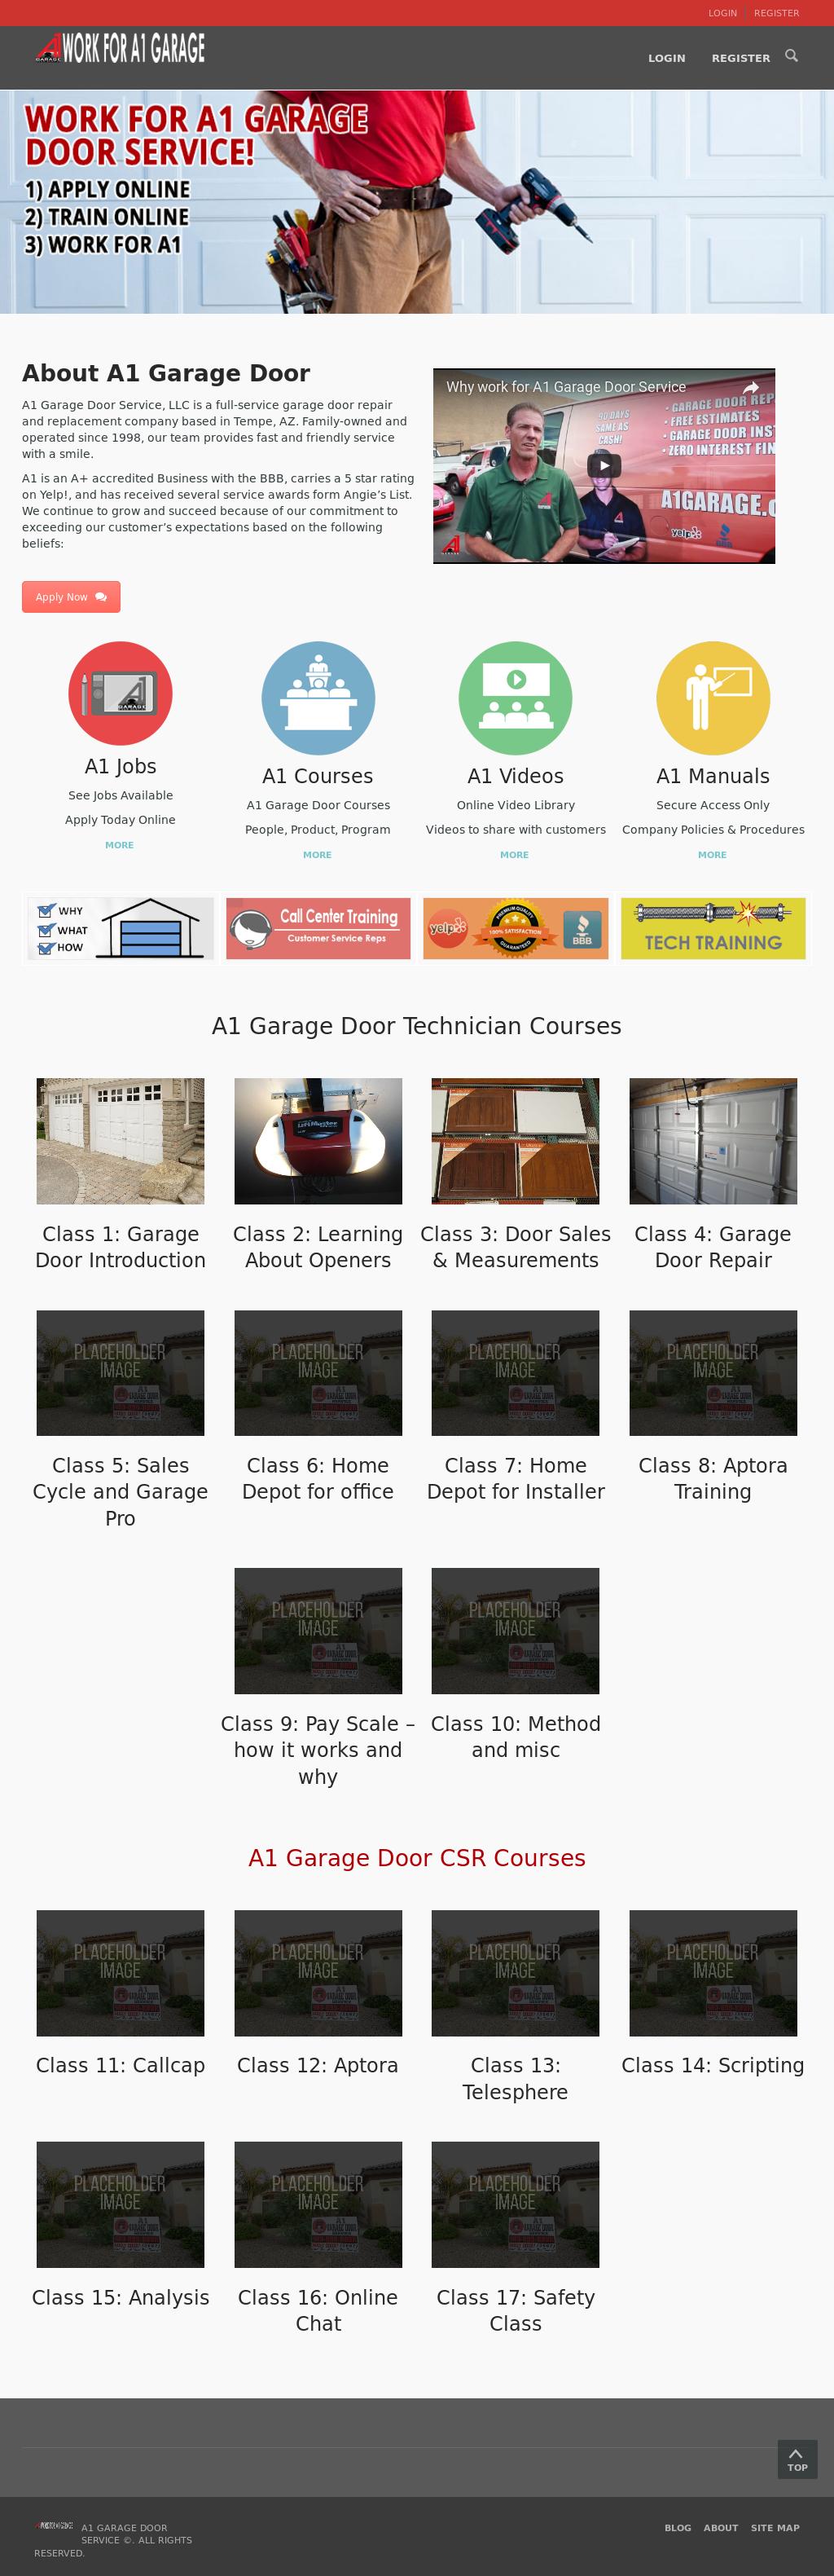 A1 Garage Door Repair Tempe Az Dandk Organizer